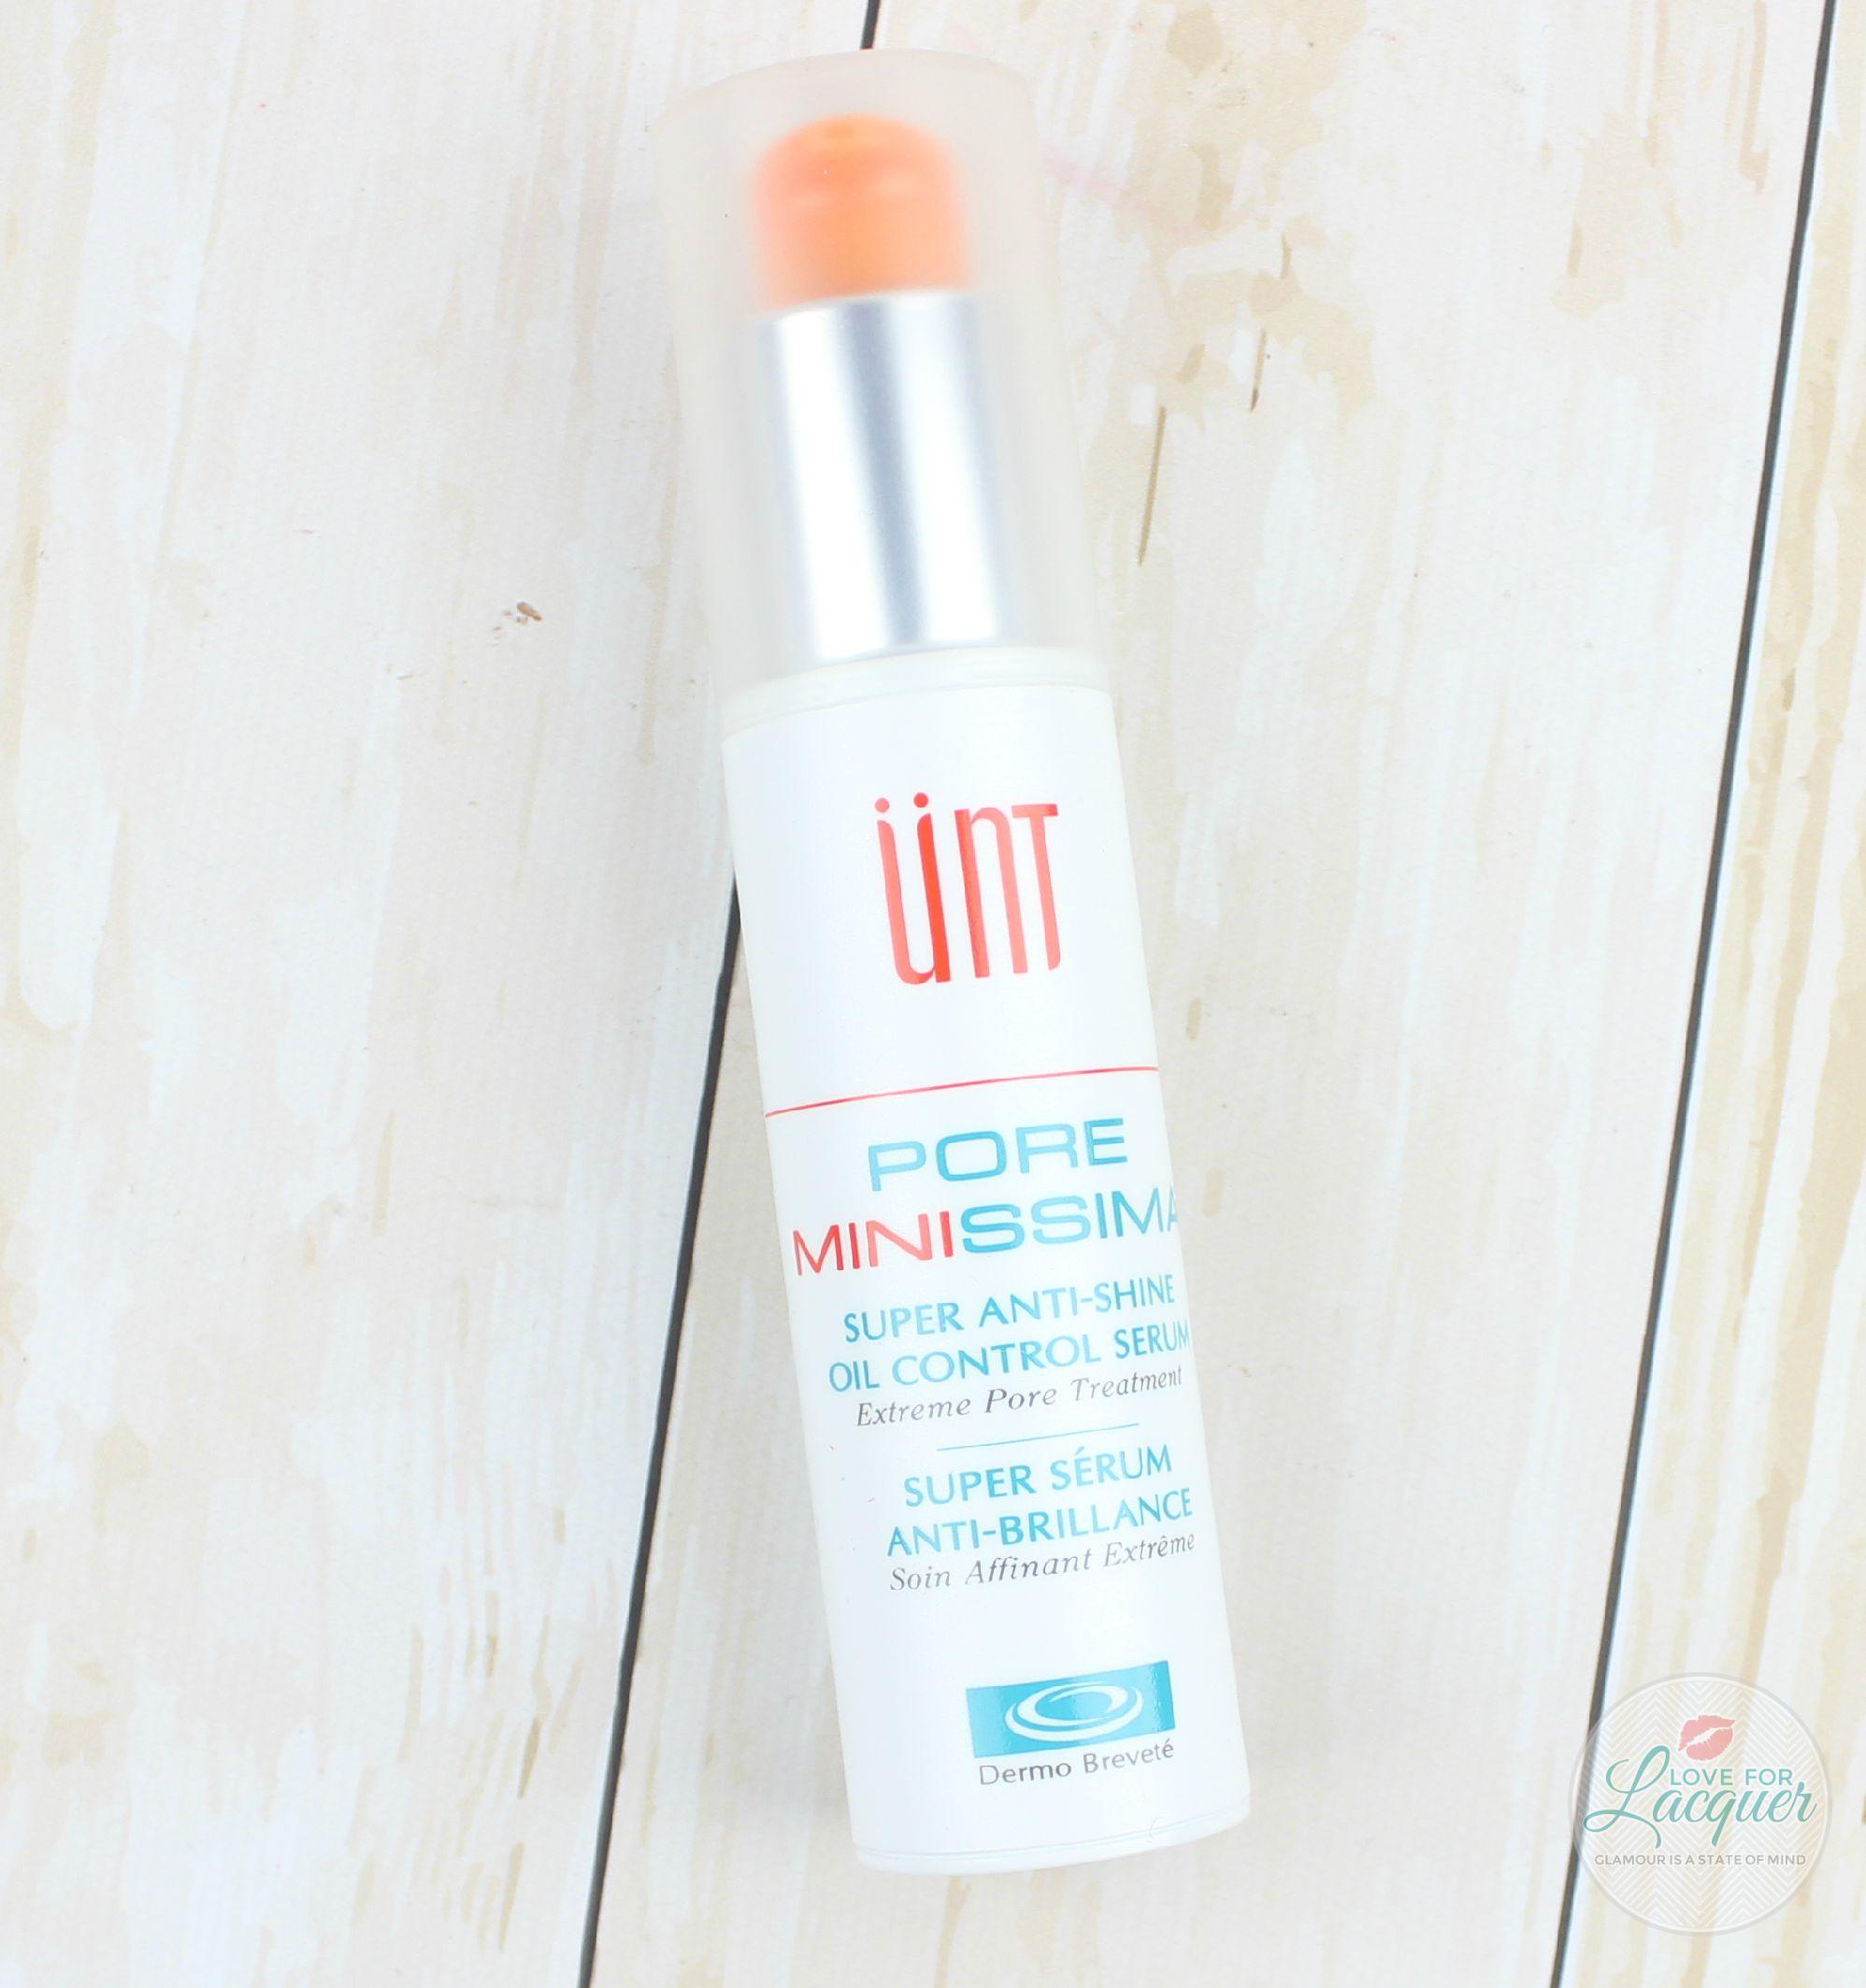 Unt Pore Minissima Super Anti Shine Oil Control Serum